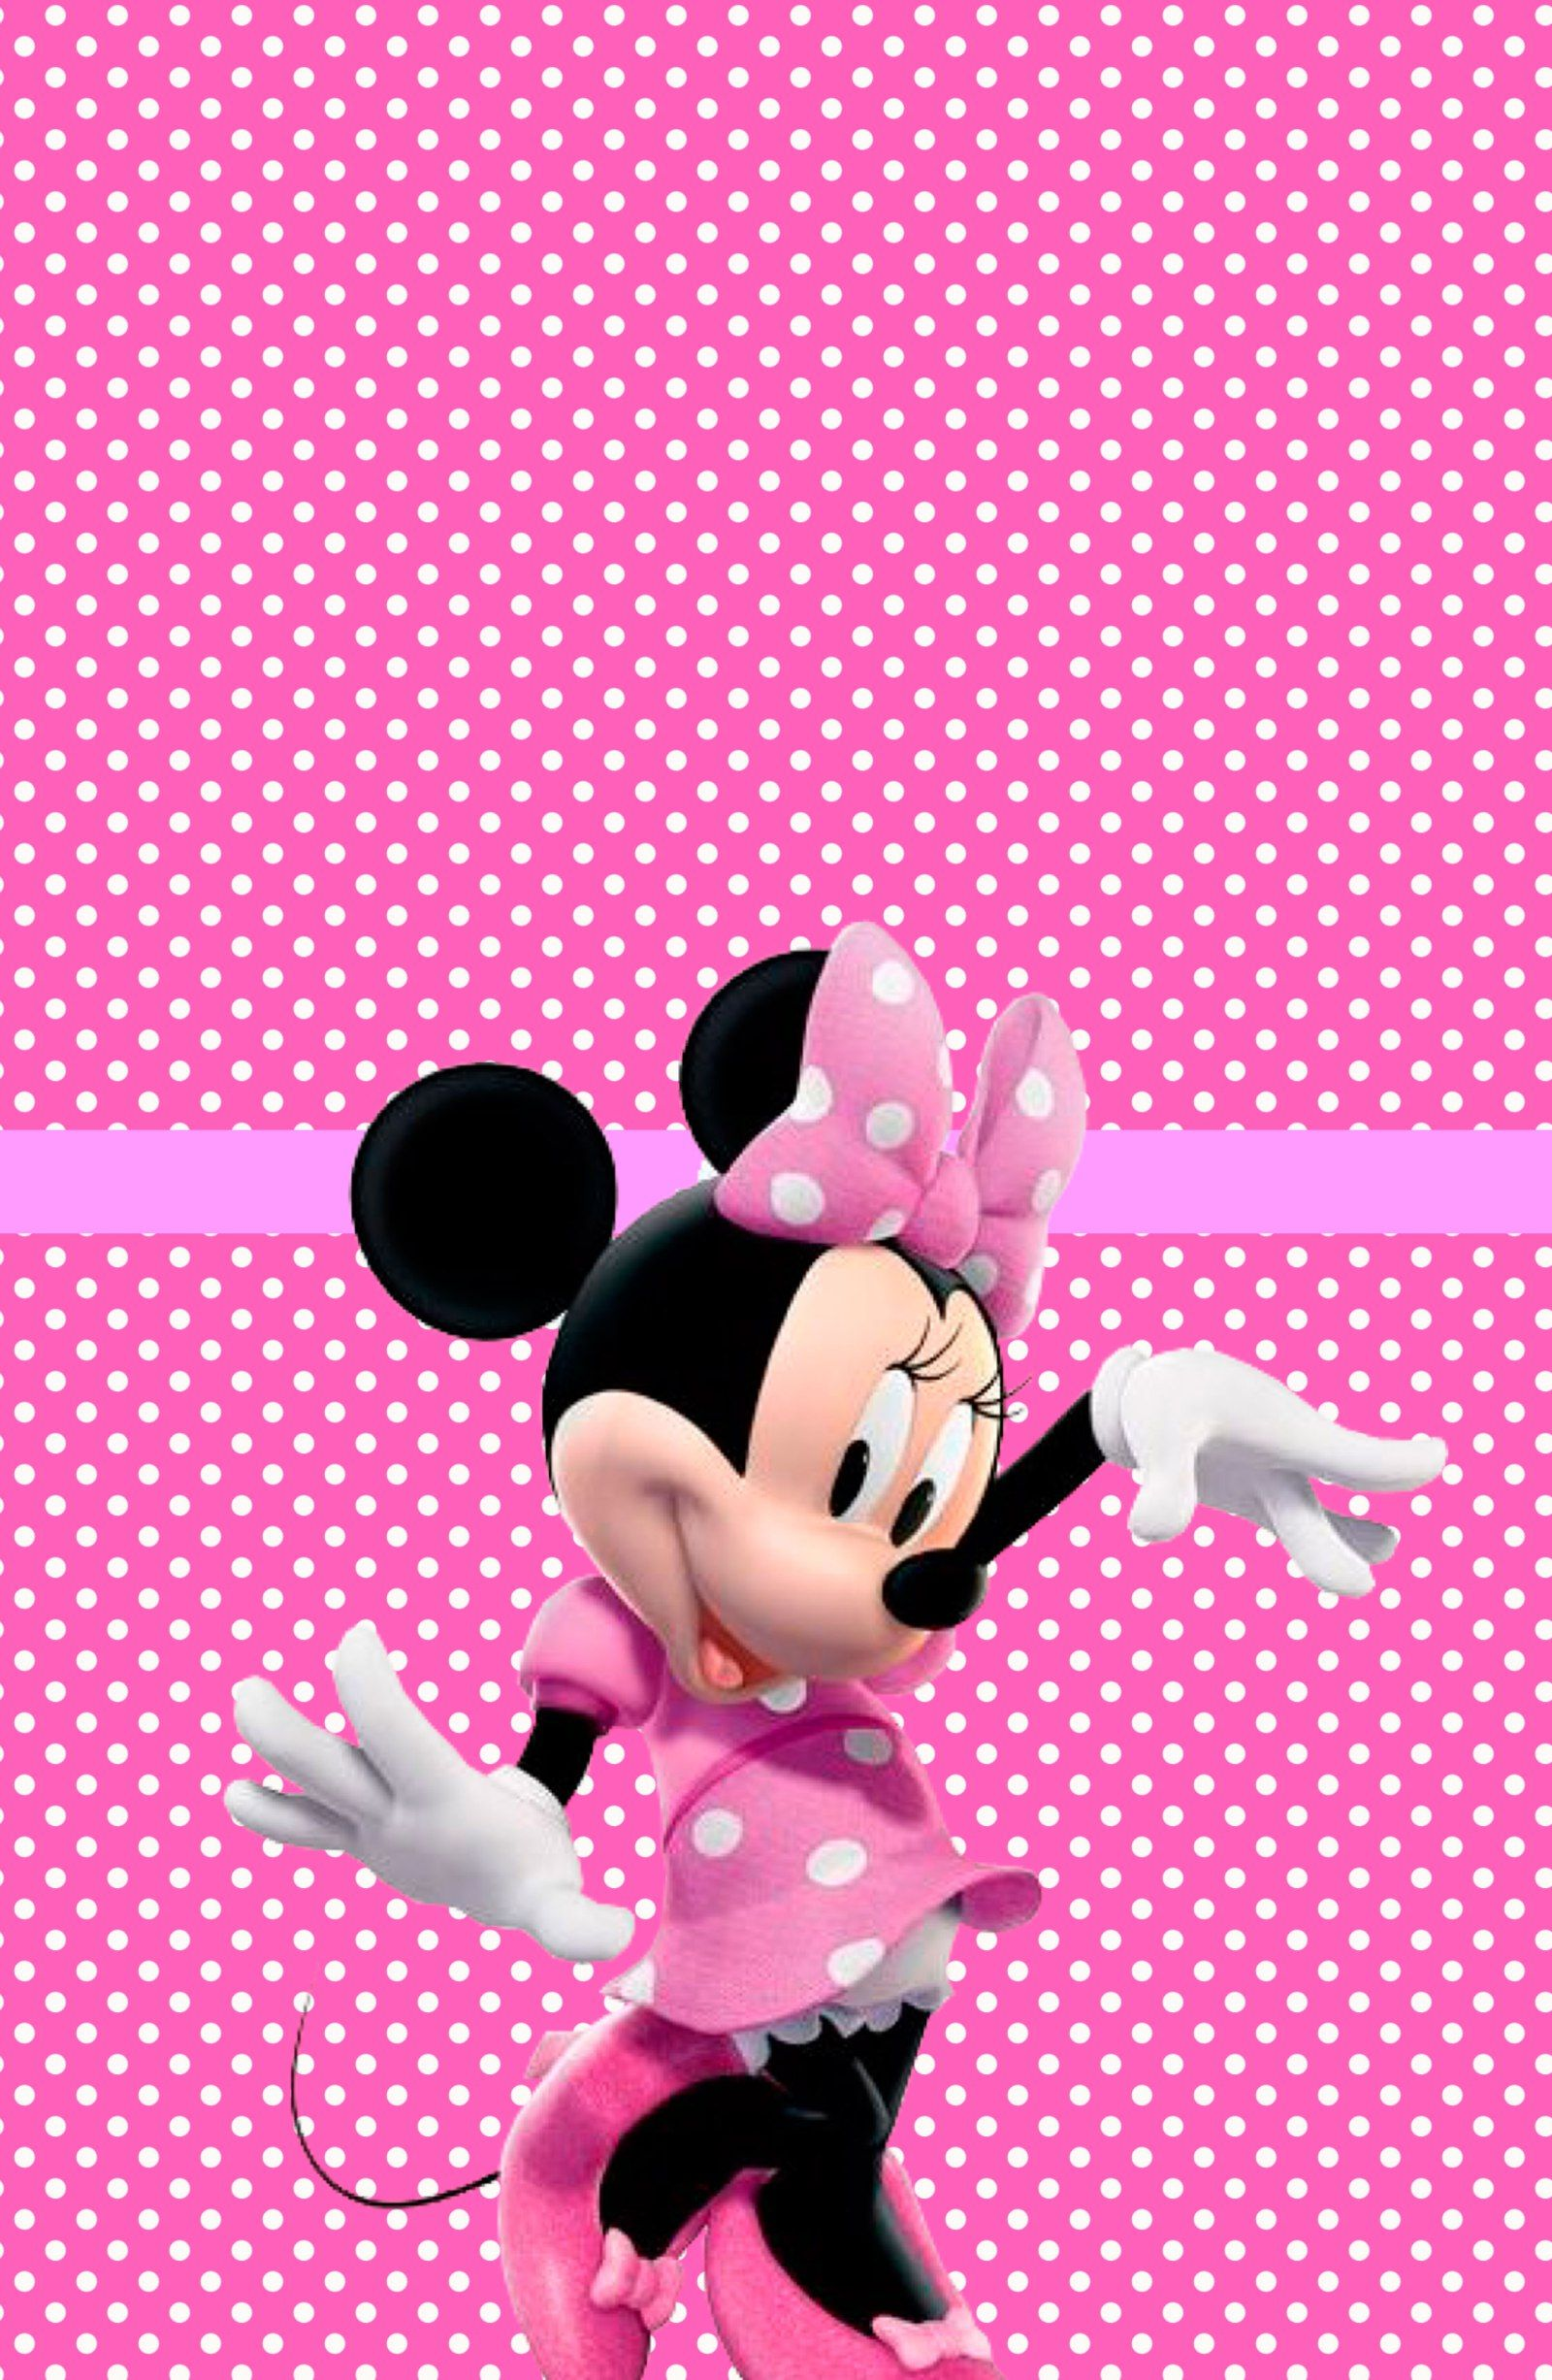 Kit Digital Minnie Rosa Tabelle Vuote Per Scriverci Pinterest